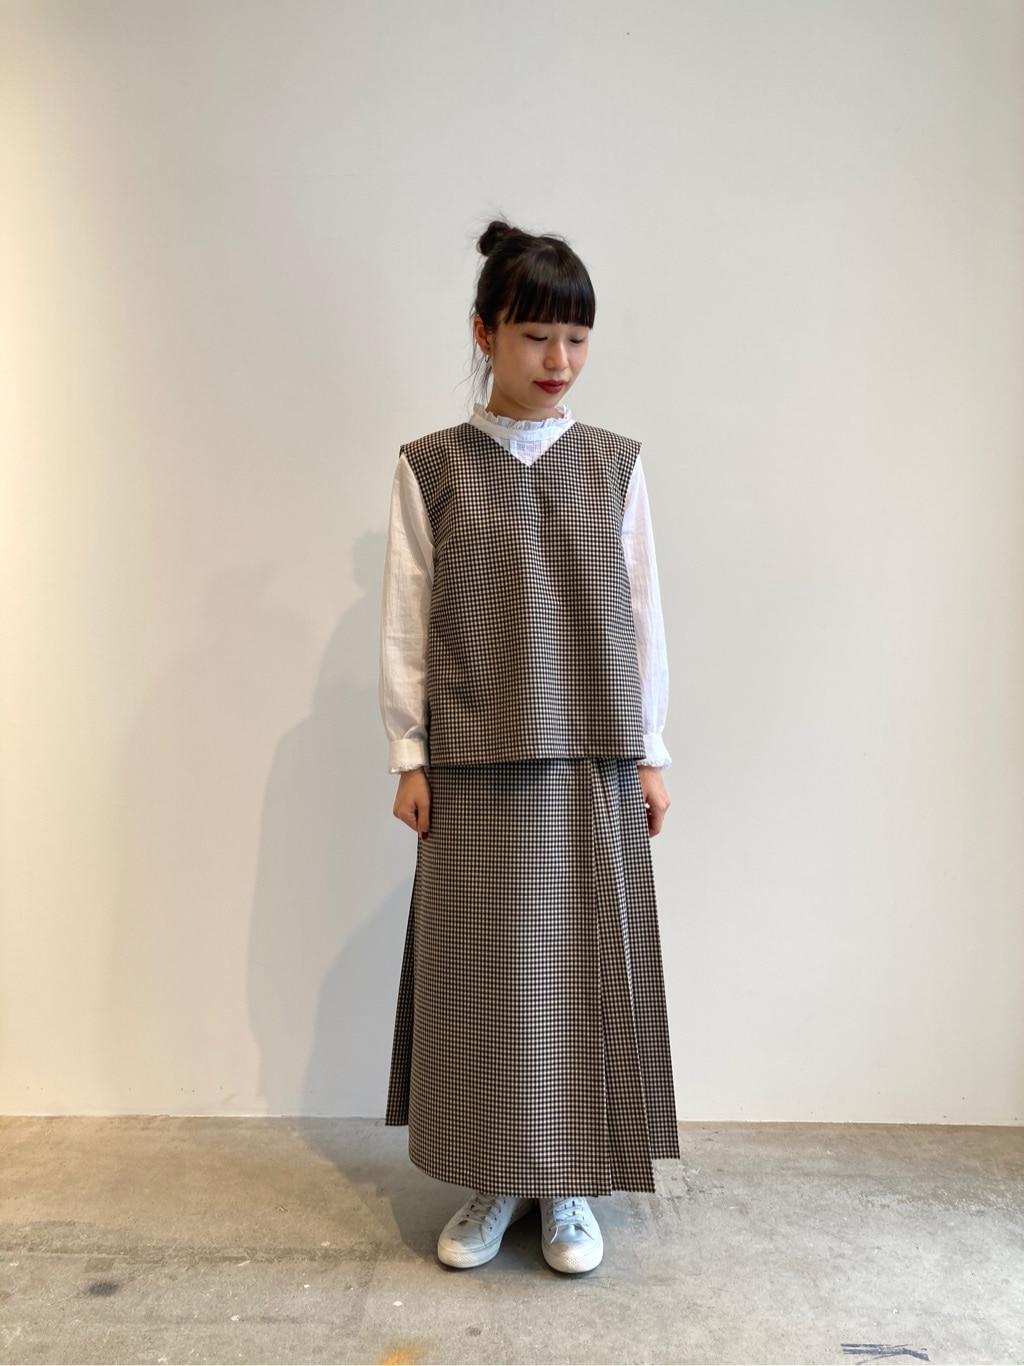 FLAT AMB 名古屋栄路面 2020.09.12